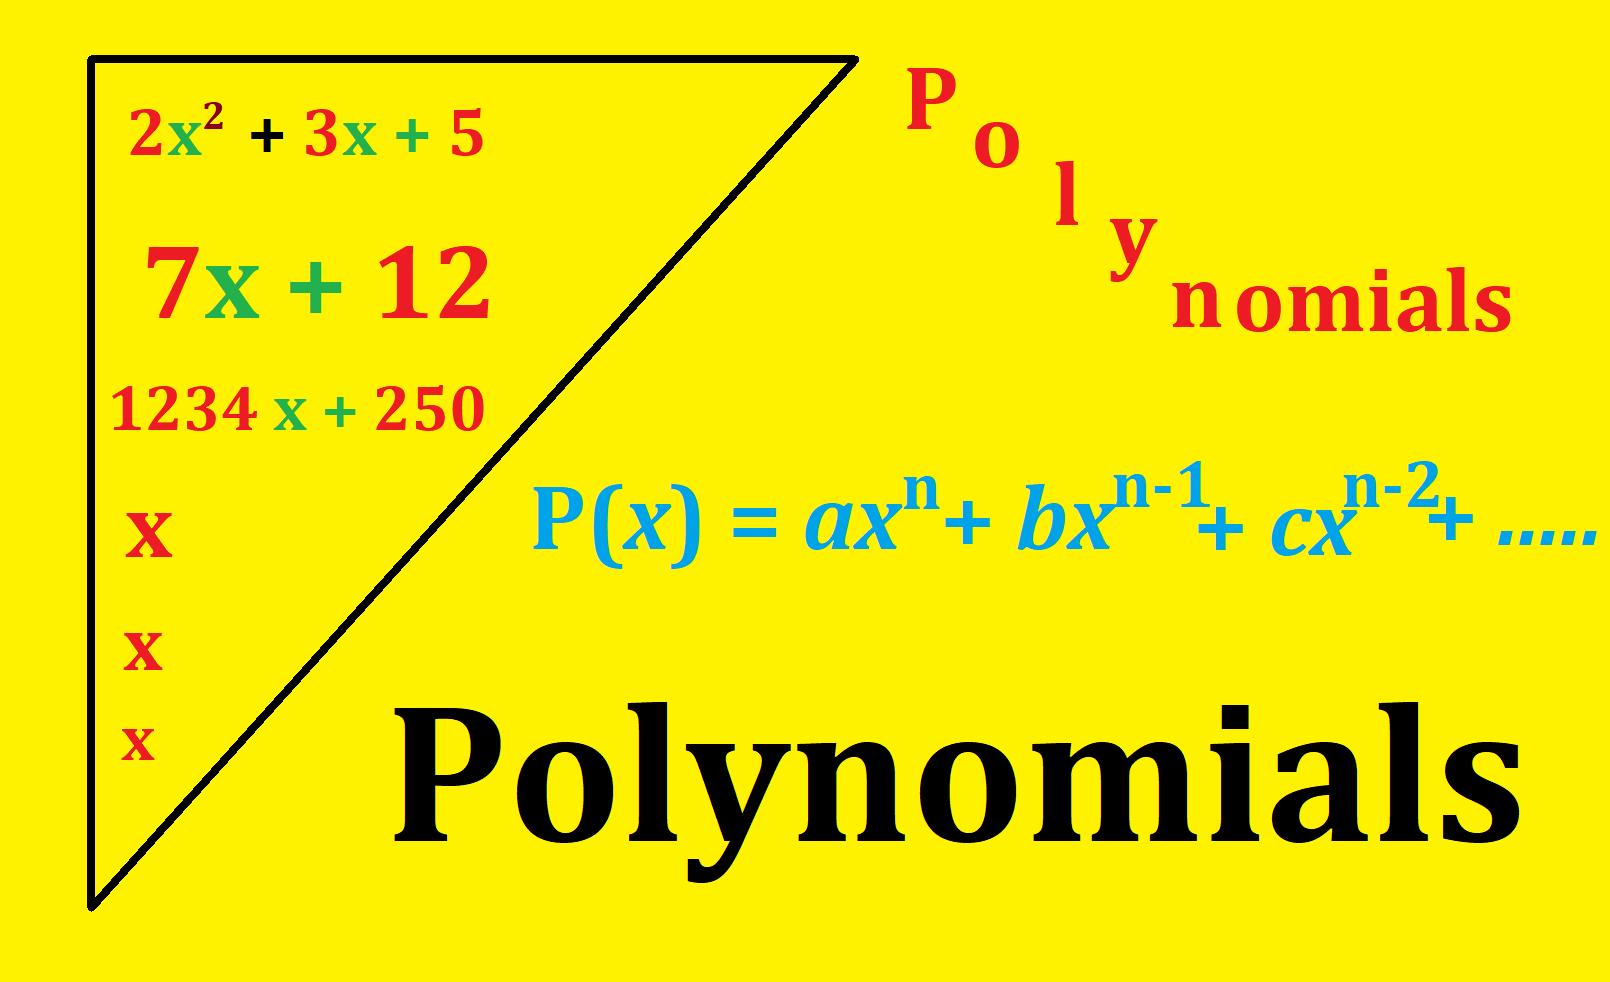 Polynomials – An integral part of mathematics to comprehend